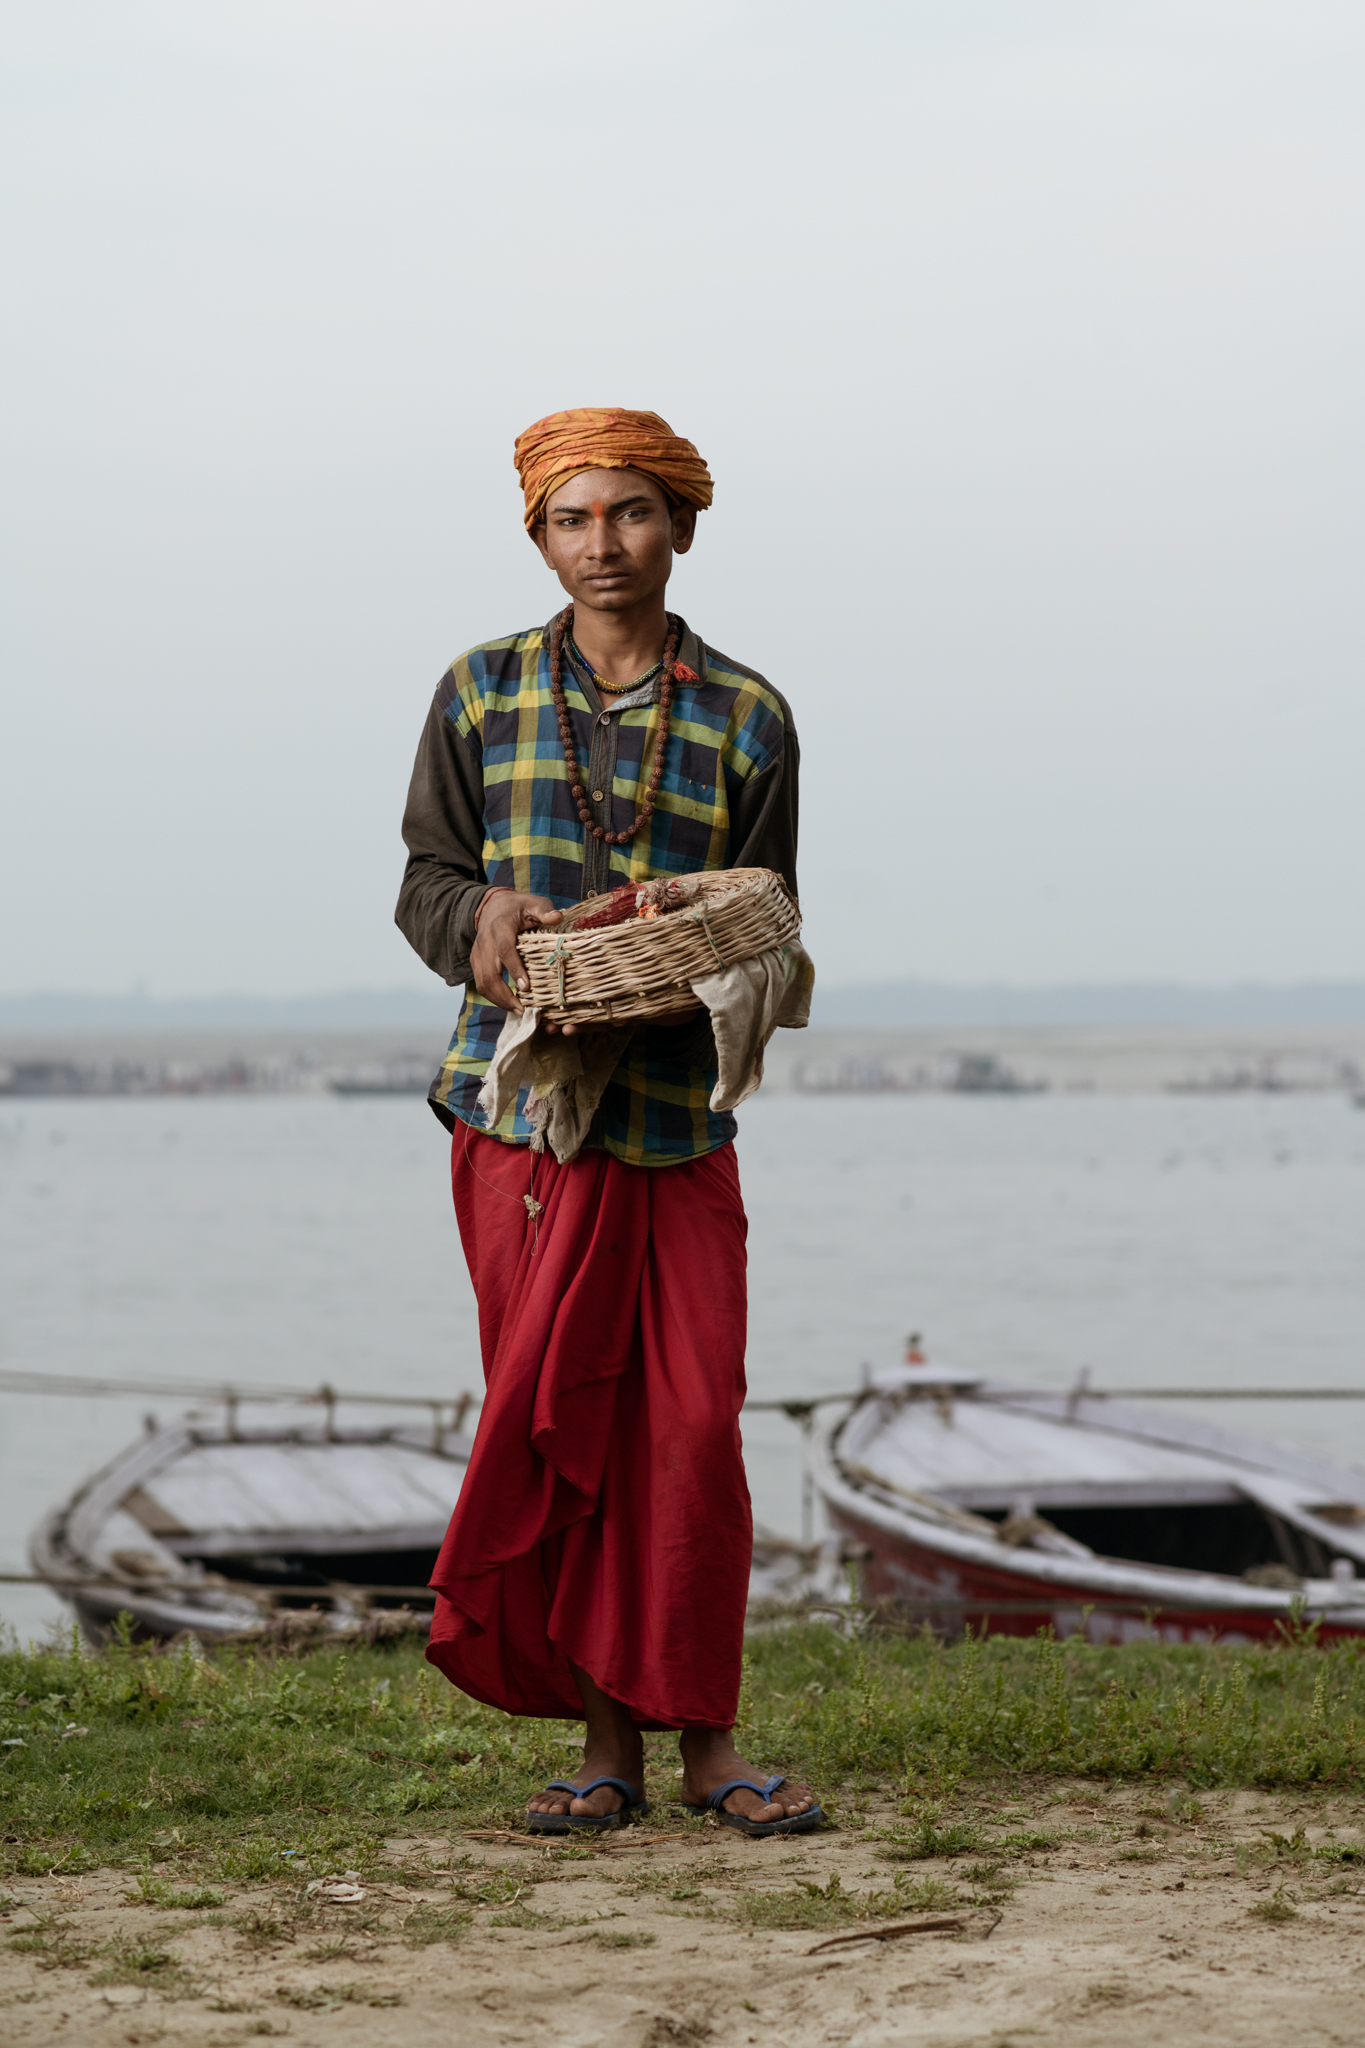 Varanasi_portrait_travel_photography_Manchester_Adventure_Photographer_Jan_Bella10.jpg